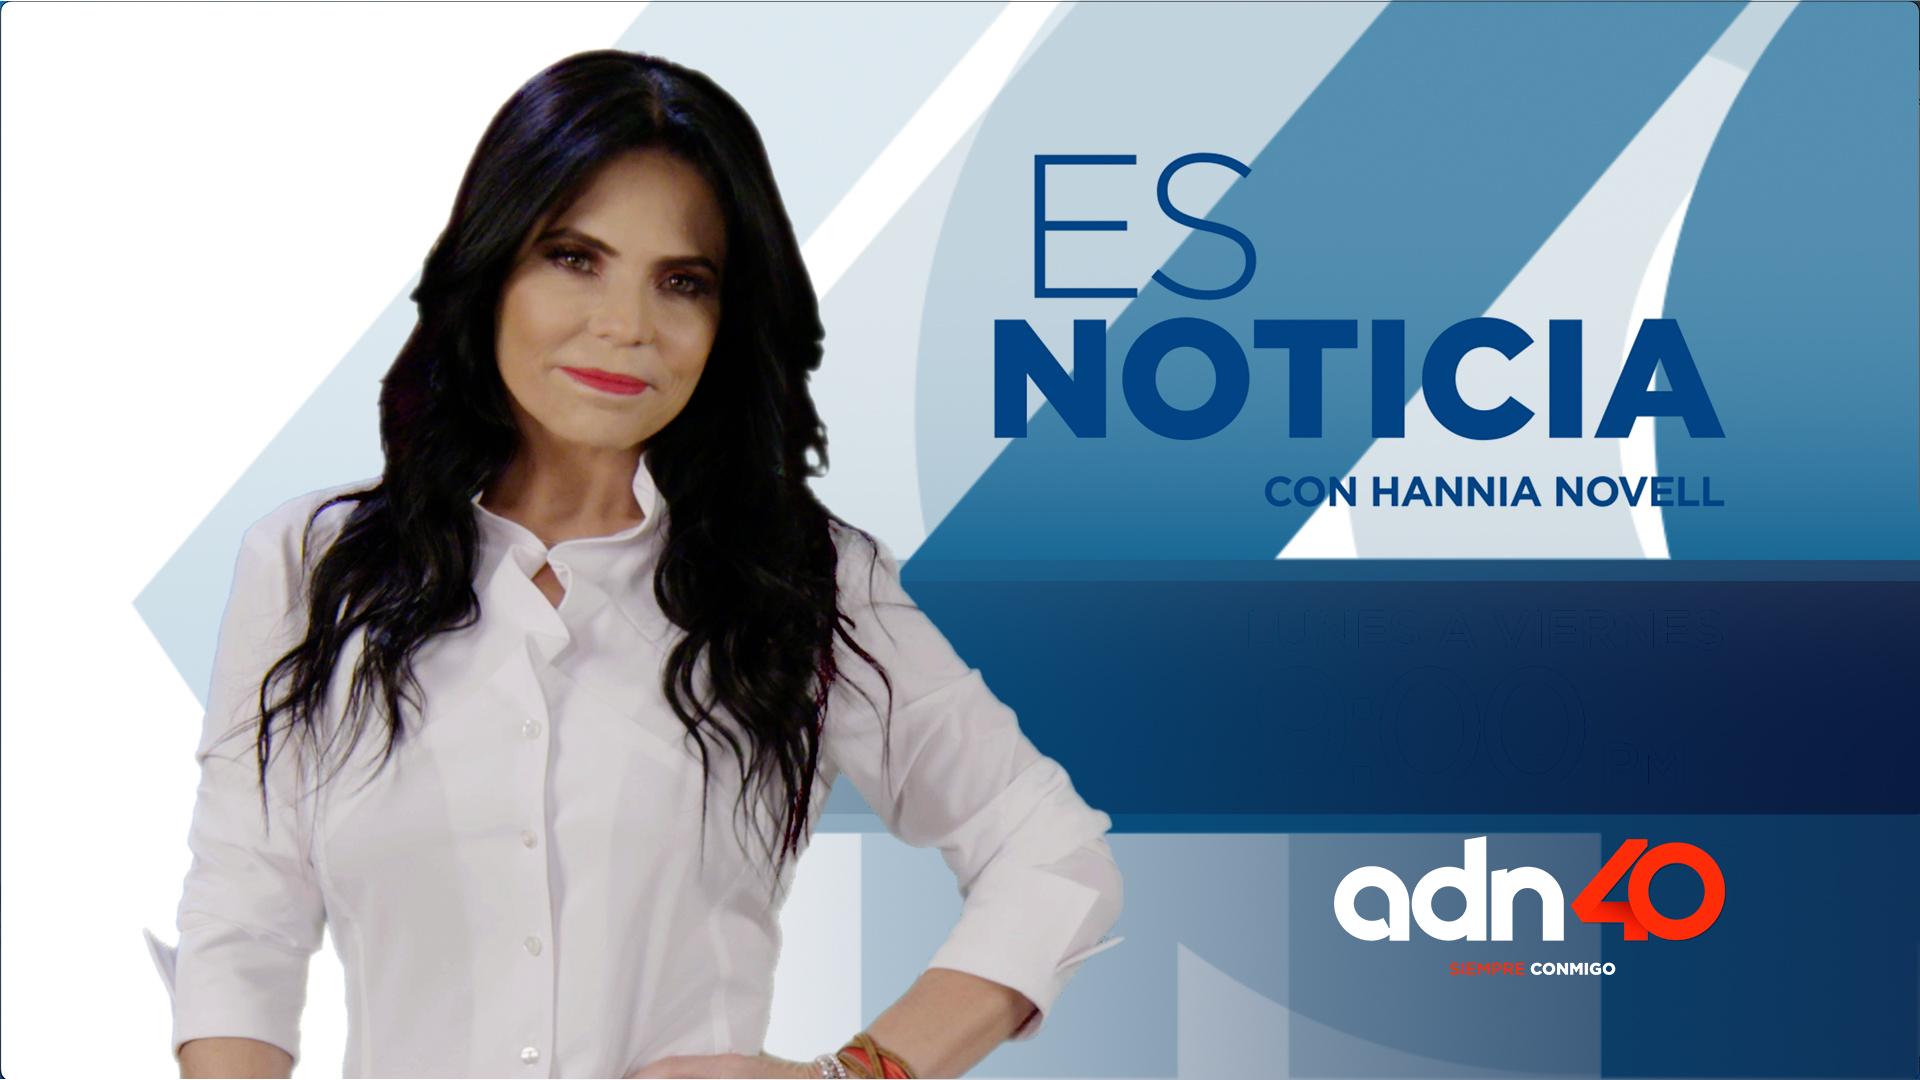 Es Noticia Con Hannia Novell